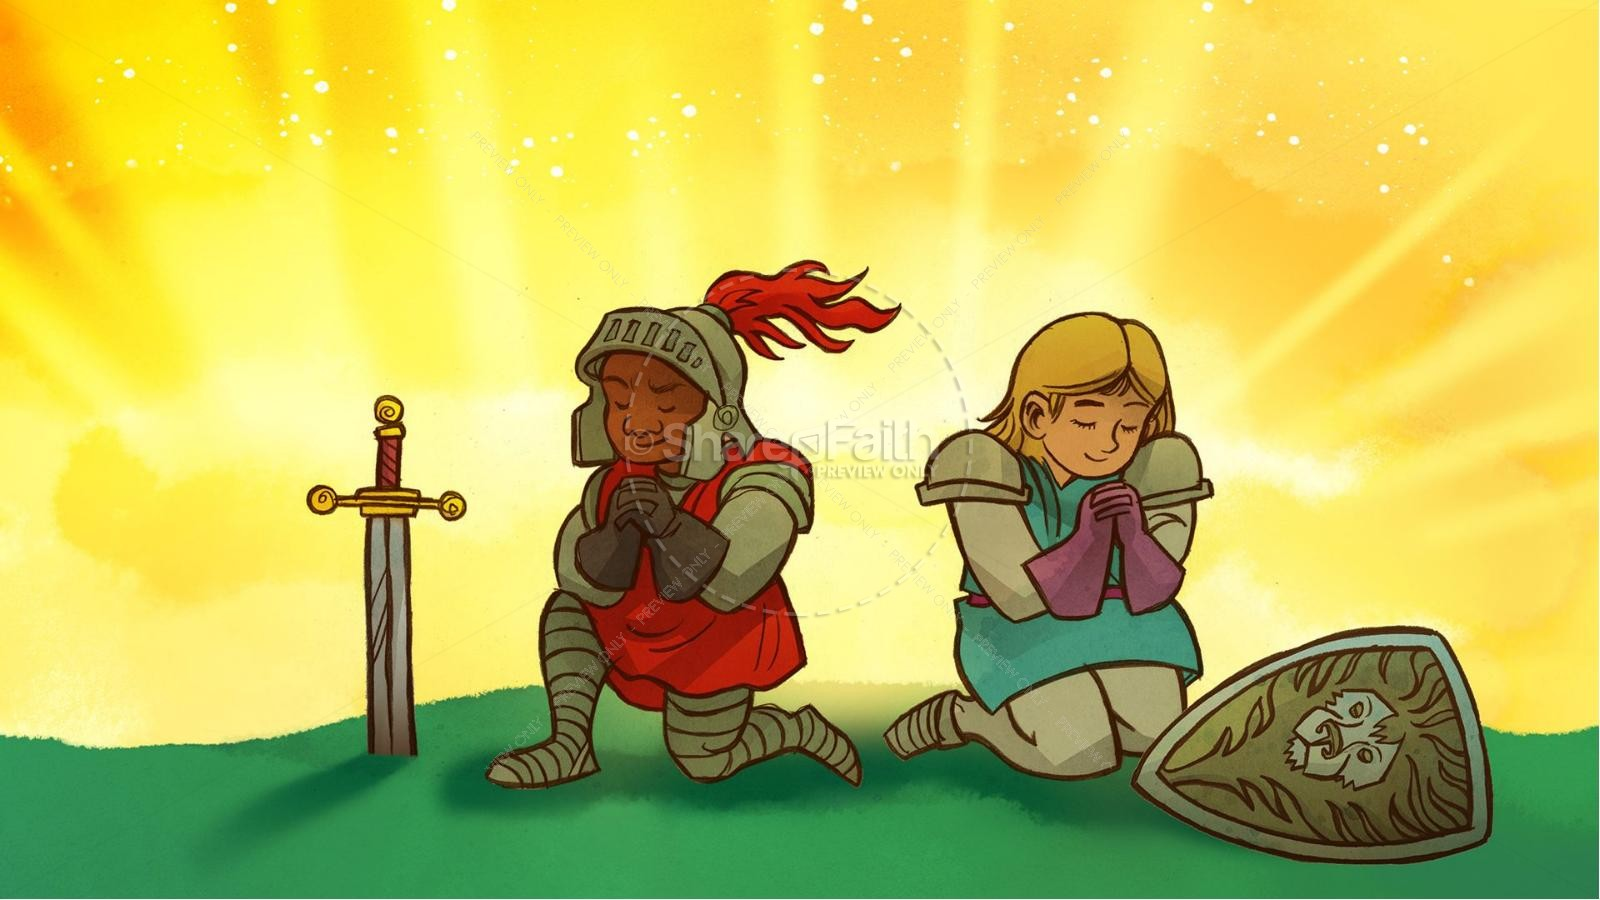 Ephesians 6 The Armor of God Kids Bible Story | slide 10